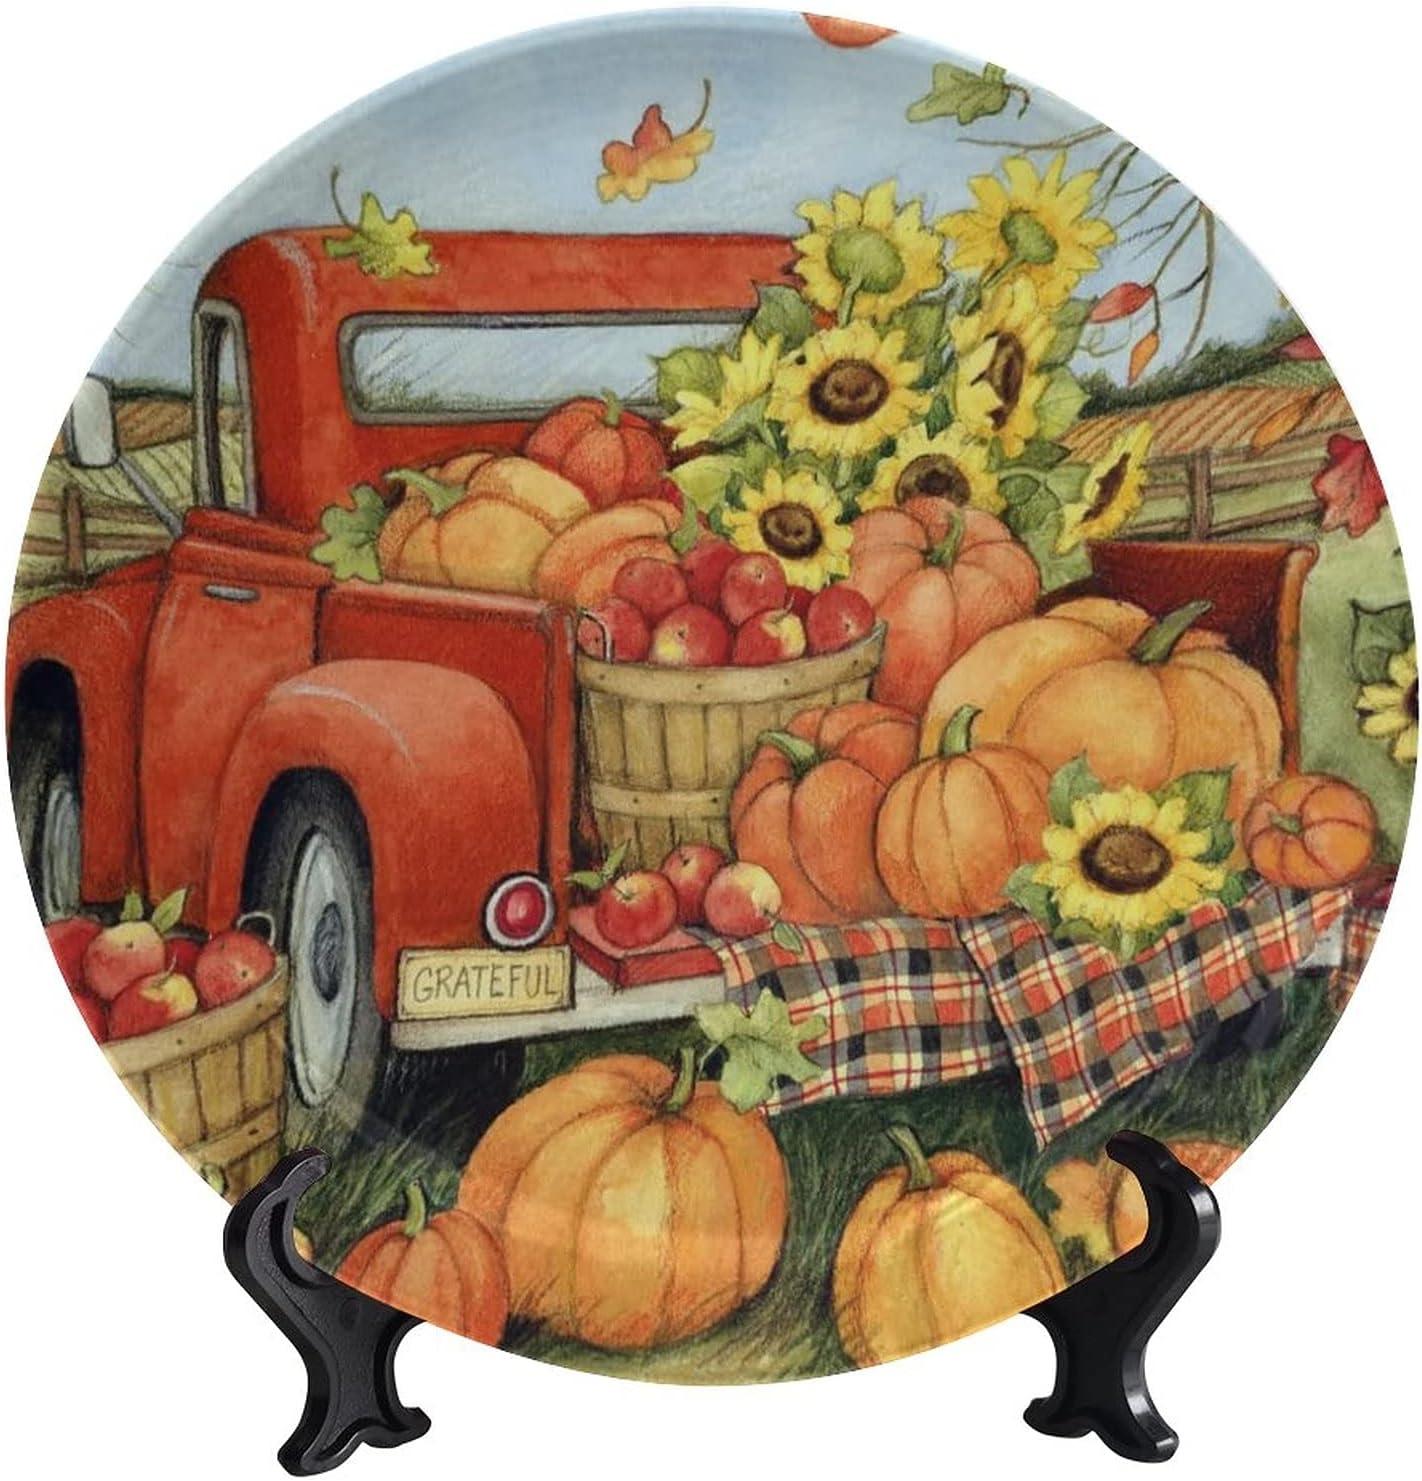 wonderr Fall Thanksgiving Ceramic Sunflower Decorative Plates Special sale item Max 46% OFF P